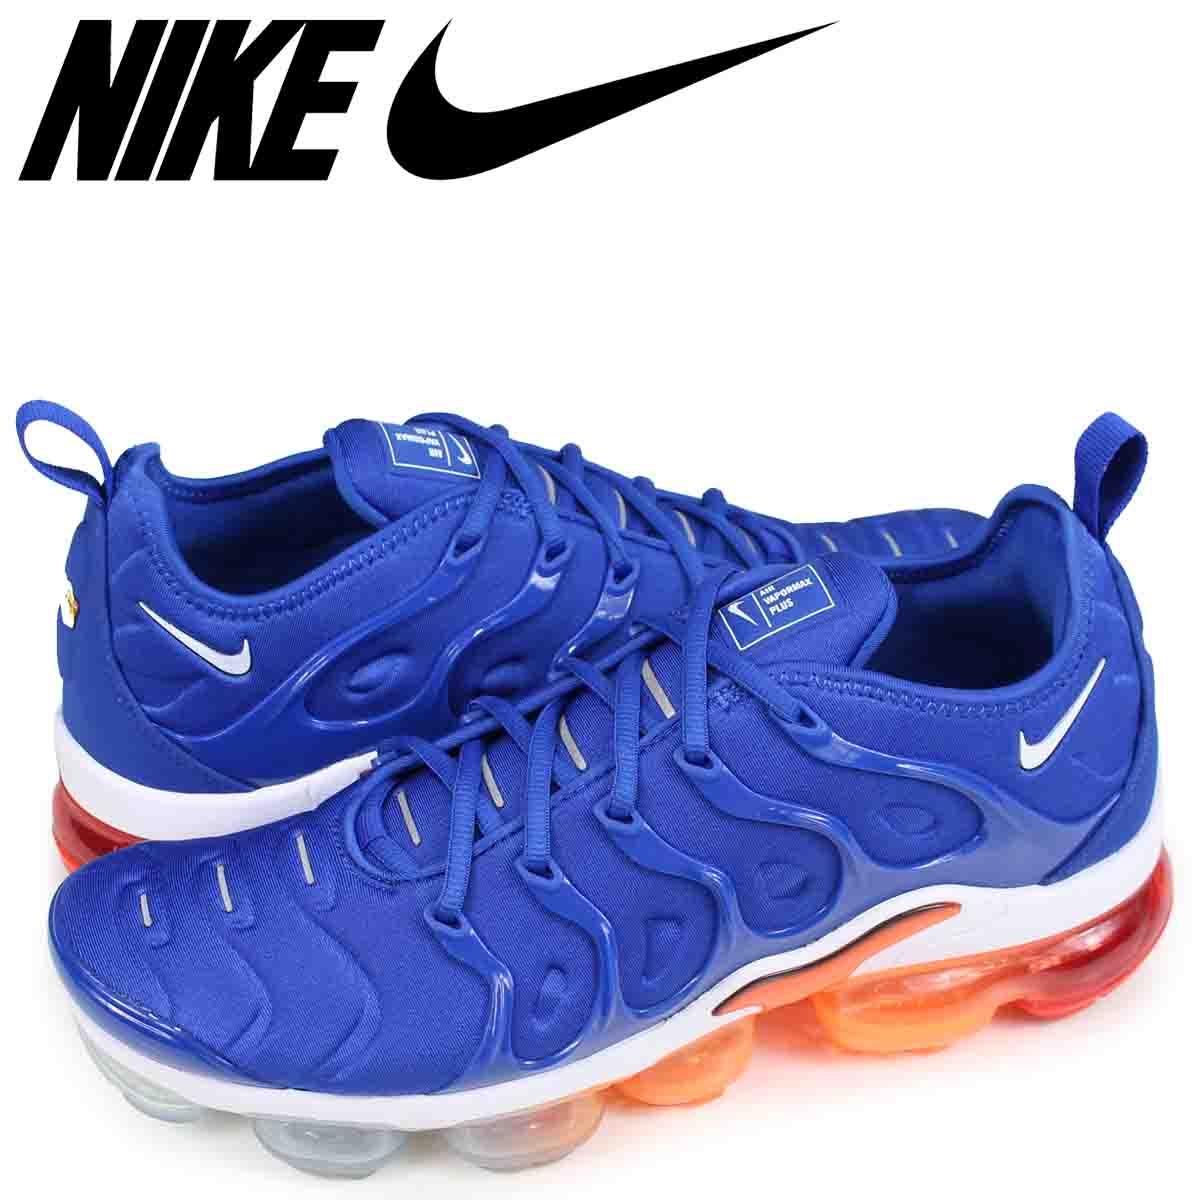 los angeles 43a51 444e9 NIKE AIR VAPORMAX PLUS Nike air vapor max plus sneakers men blue 924,453-403